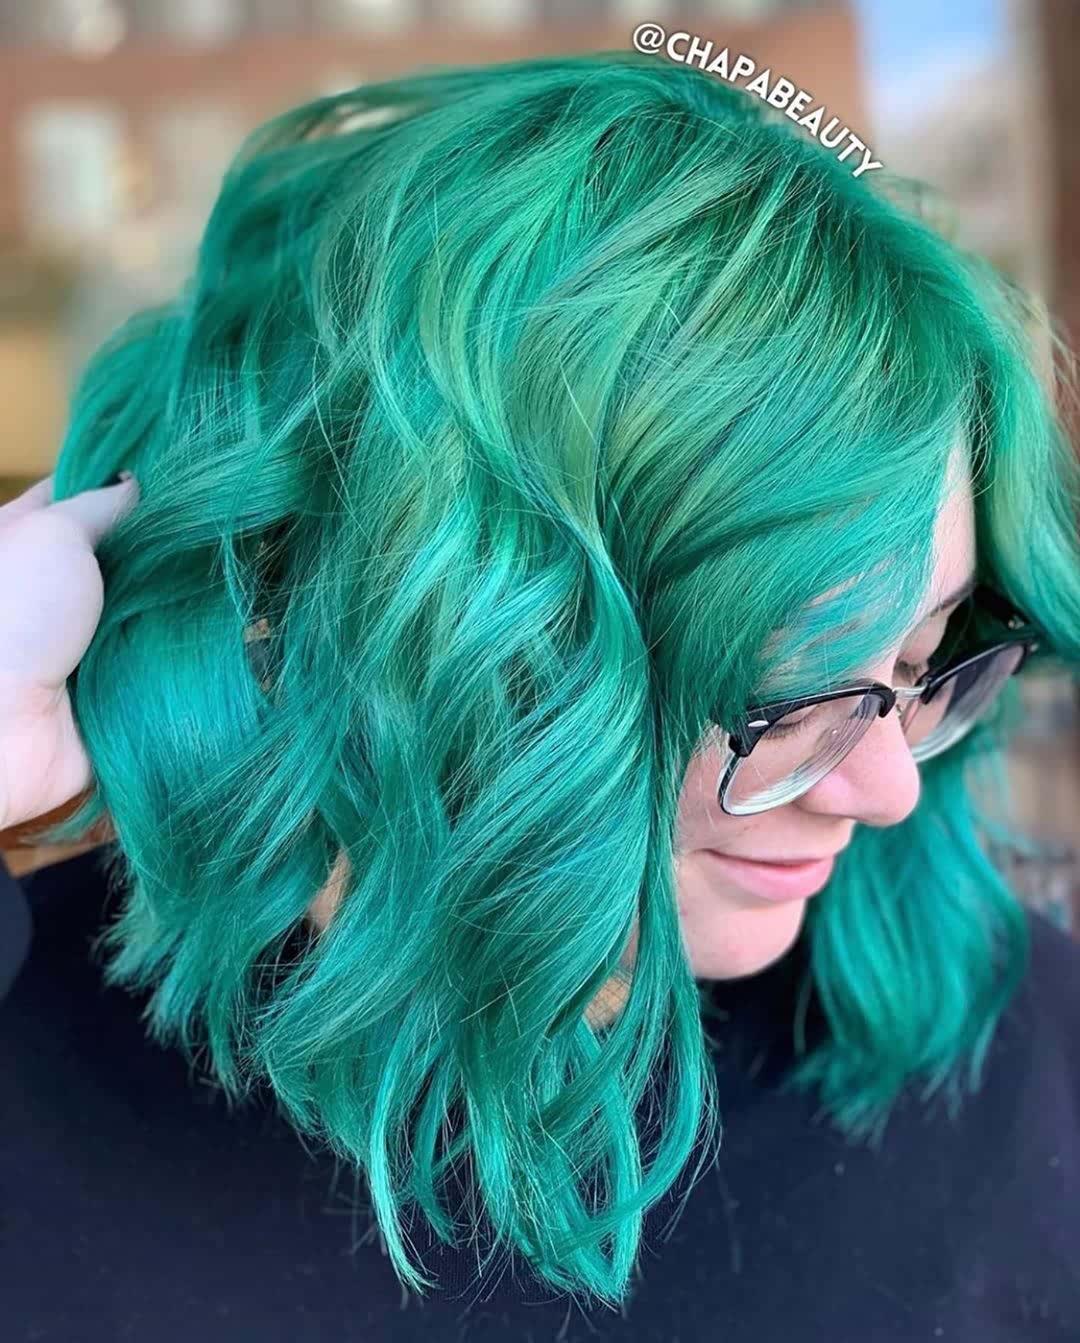 Hair Color Ideas for Bob Hairstyles